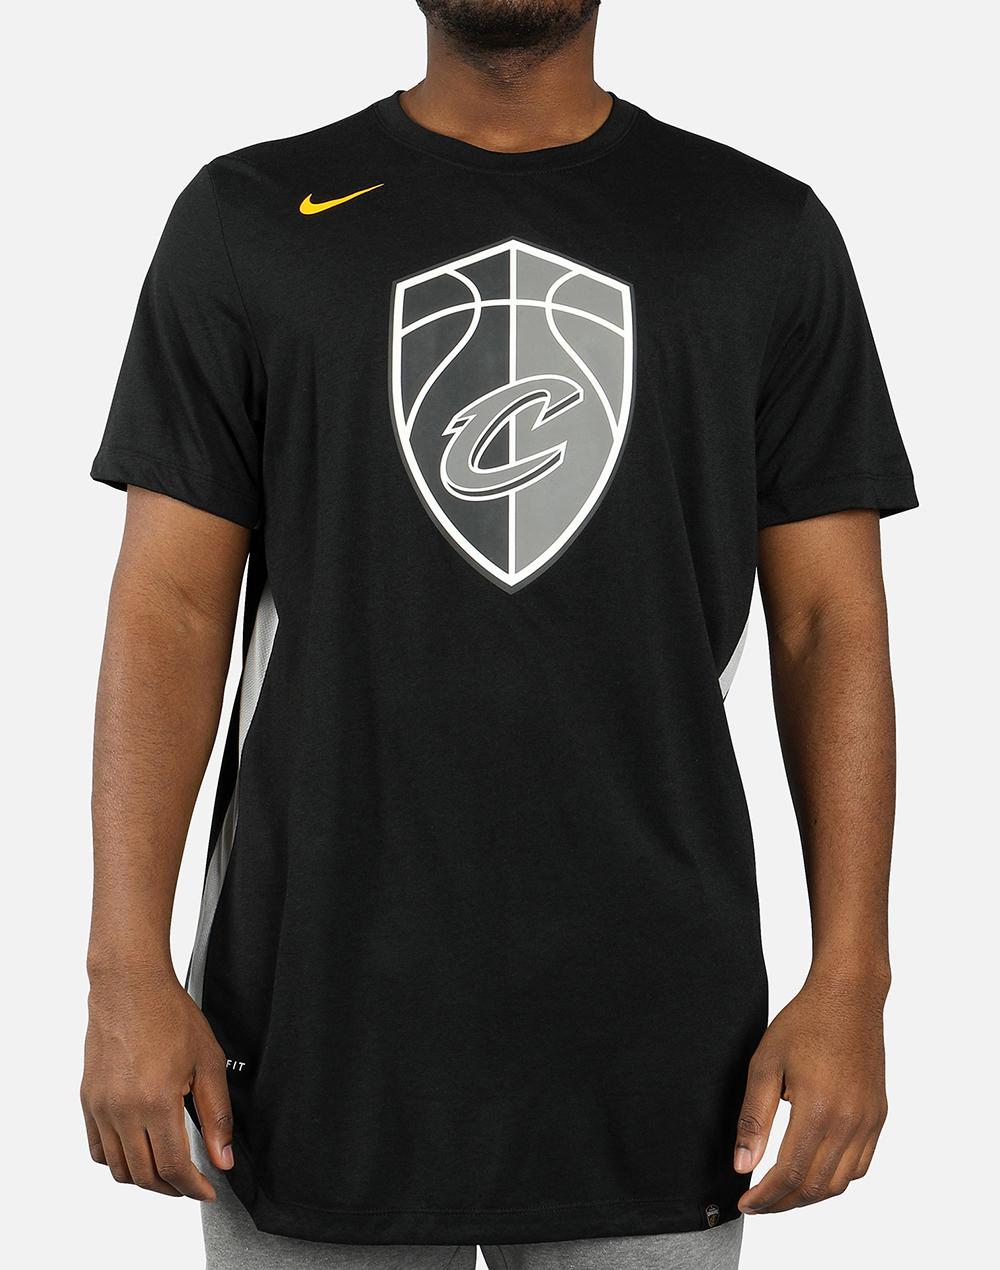 581c05b0958c Nike NBA Cleveland Cavaliers City Edition Dri-Fit Tee - NBA Shop Cleveland  Cavaliers Merchandise - Superfanas.lt